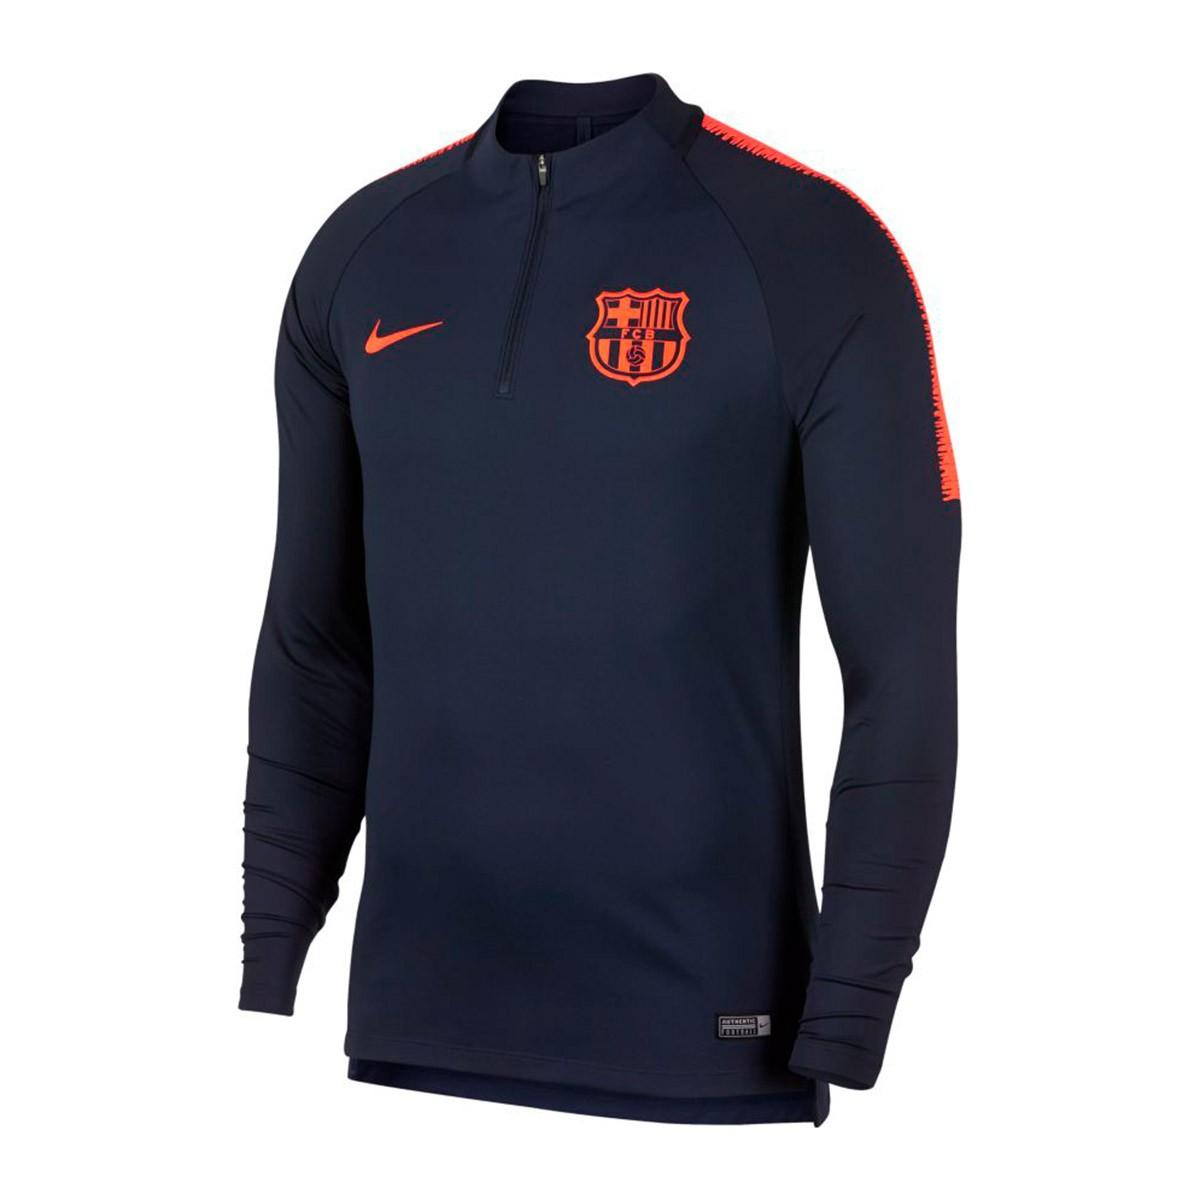 b2c118433e60c Camiseta Nike FC Barcelona Dry Squad Dril Top 2017-2018 Obsidian-Hyper  crimson - Tienda de fútbol Fútbol Emotion